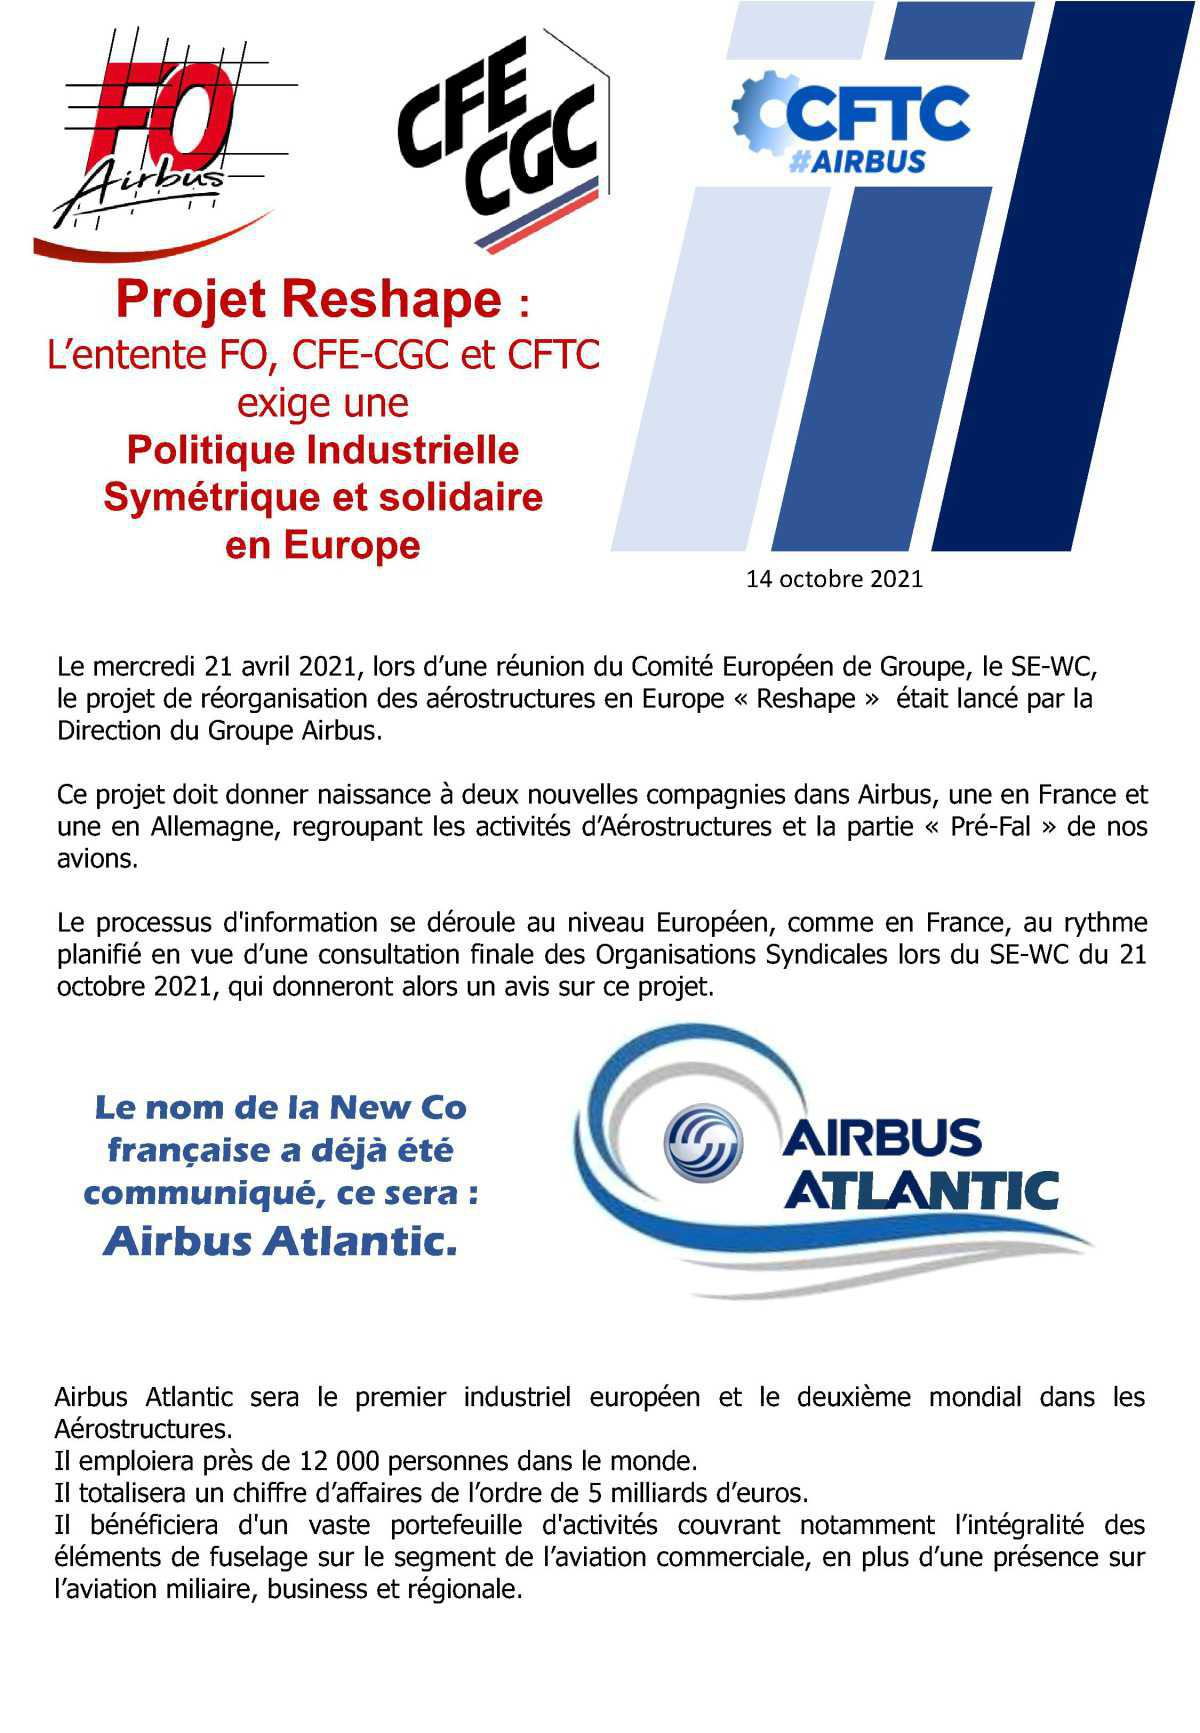 Projet Reshape